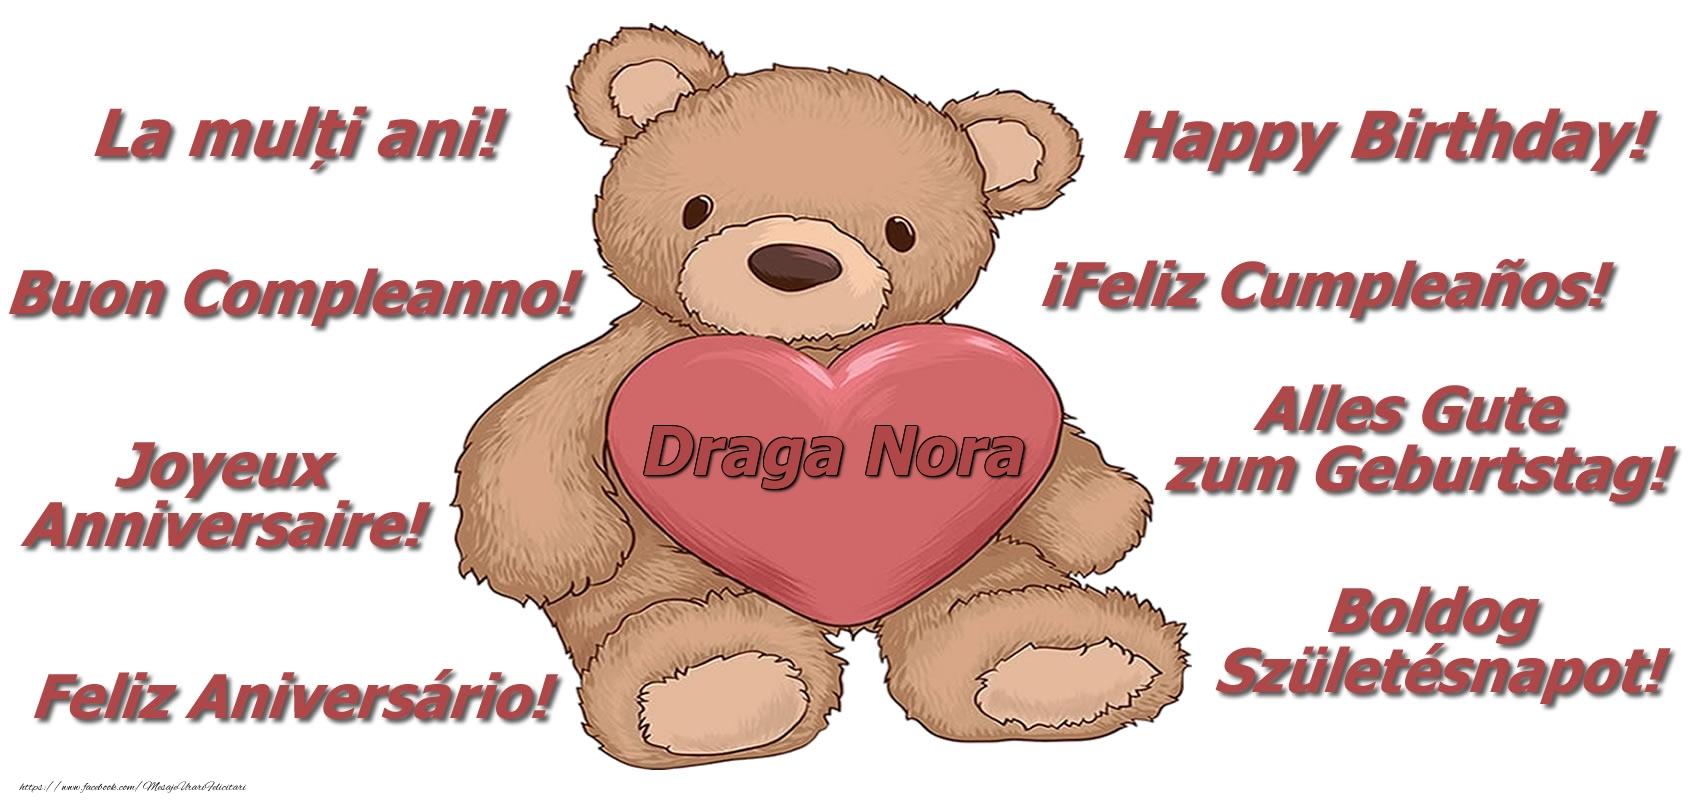 Felicitari frumoase de zi de nastere pentru Nora   La multi ani draga nora! - Ursulet